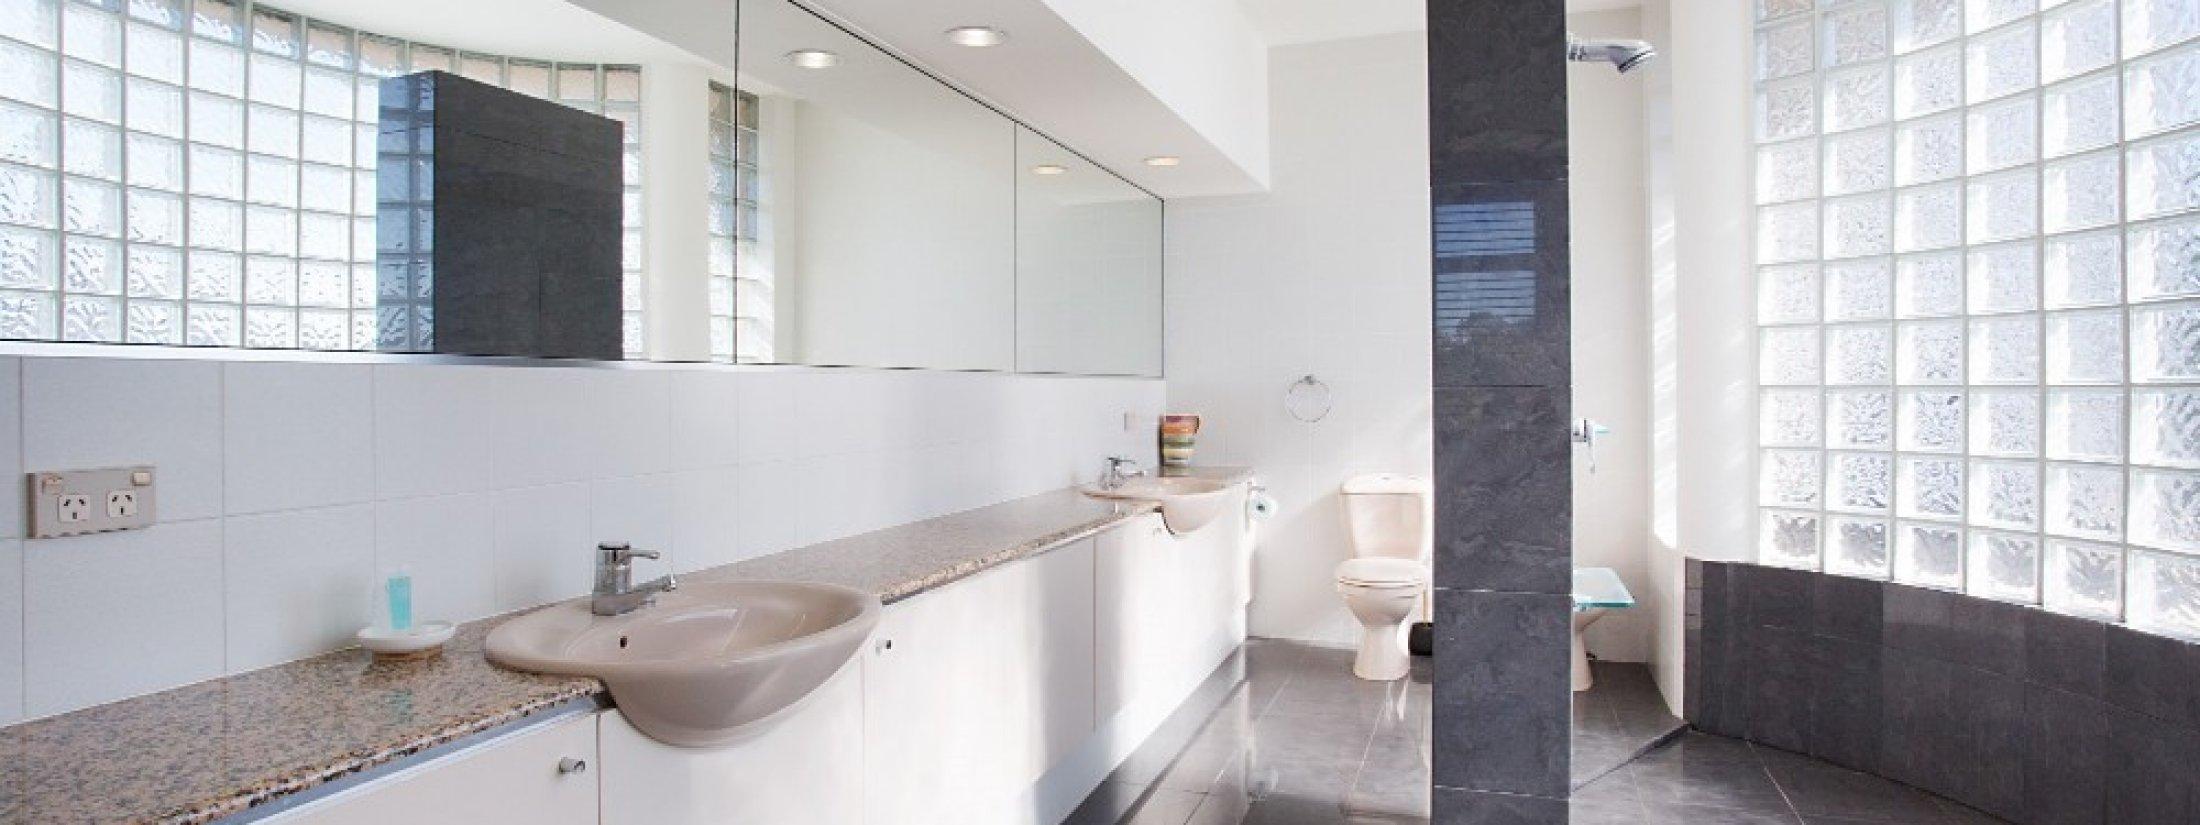 Chevron Oasis - Gold Coast - Bathroom 3